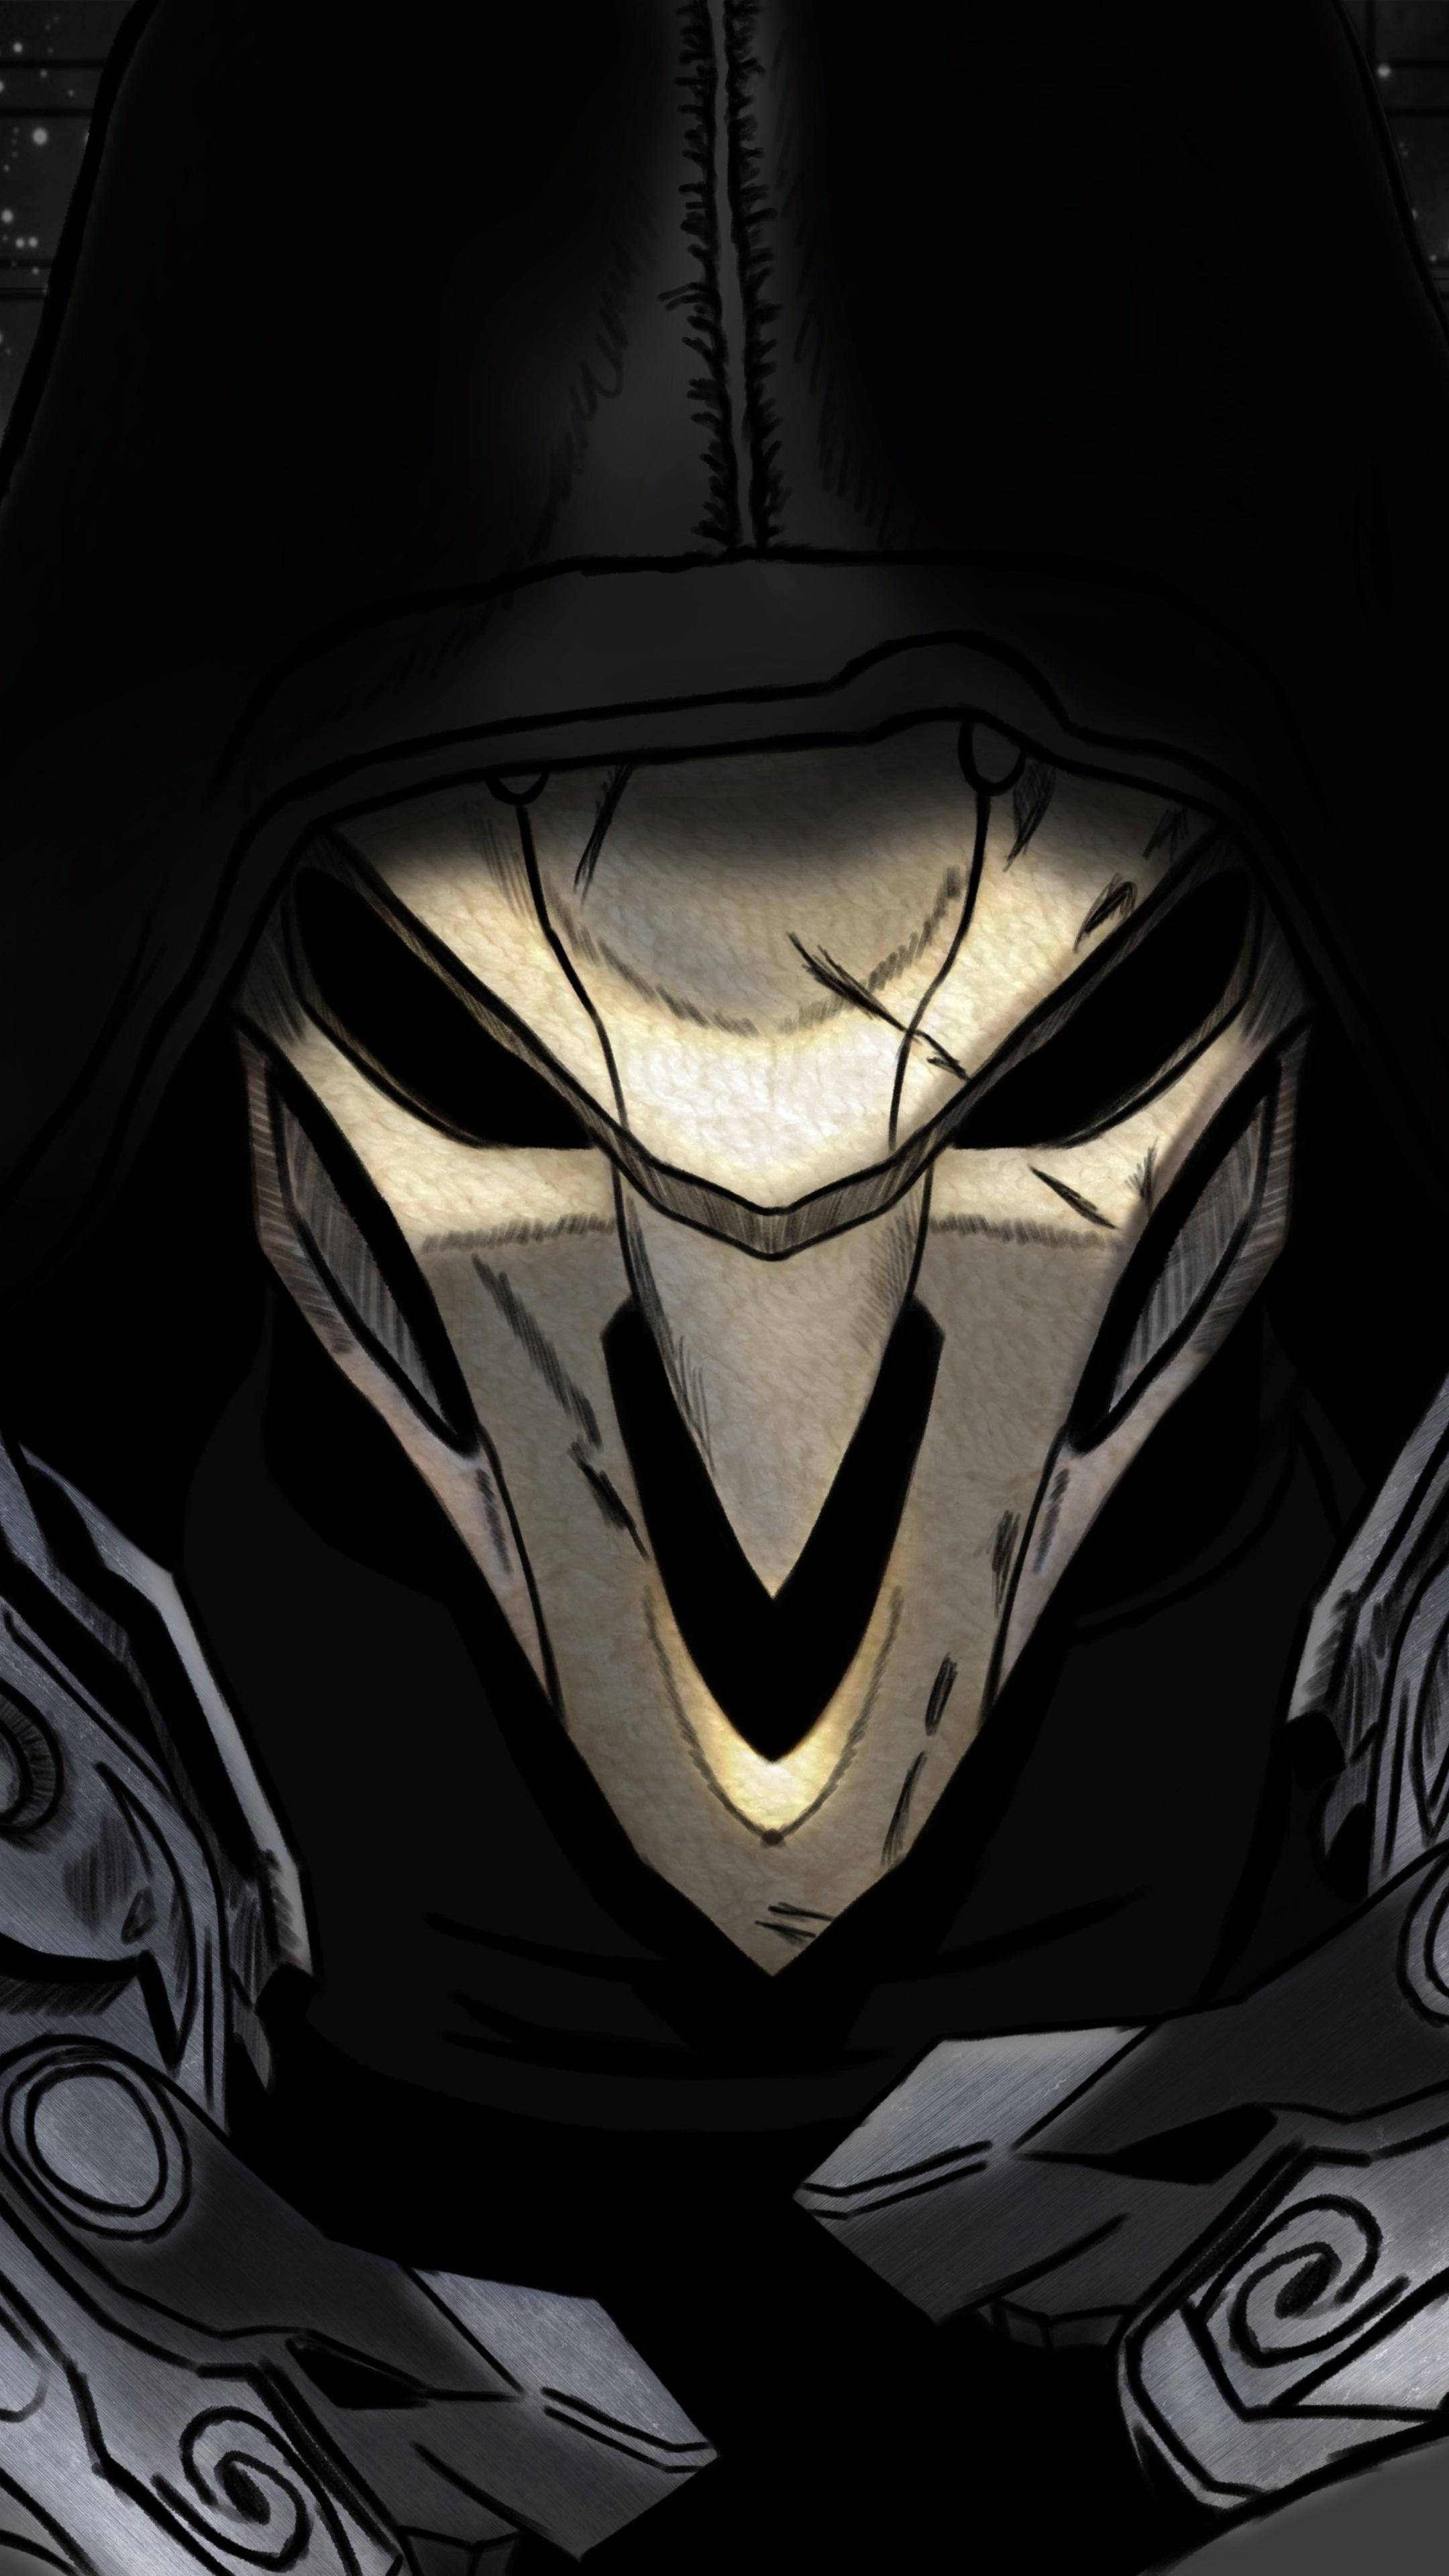 2160x3840 reaper overwatch art 4k sony xperia x xz z5 - Art wallpaper 2160x3840 ...